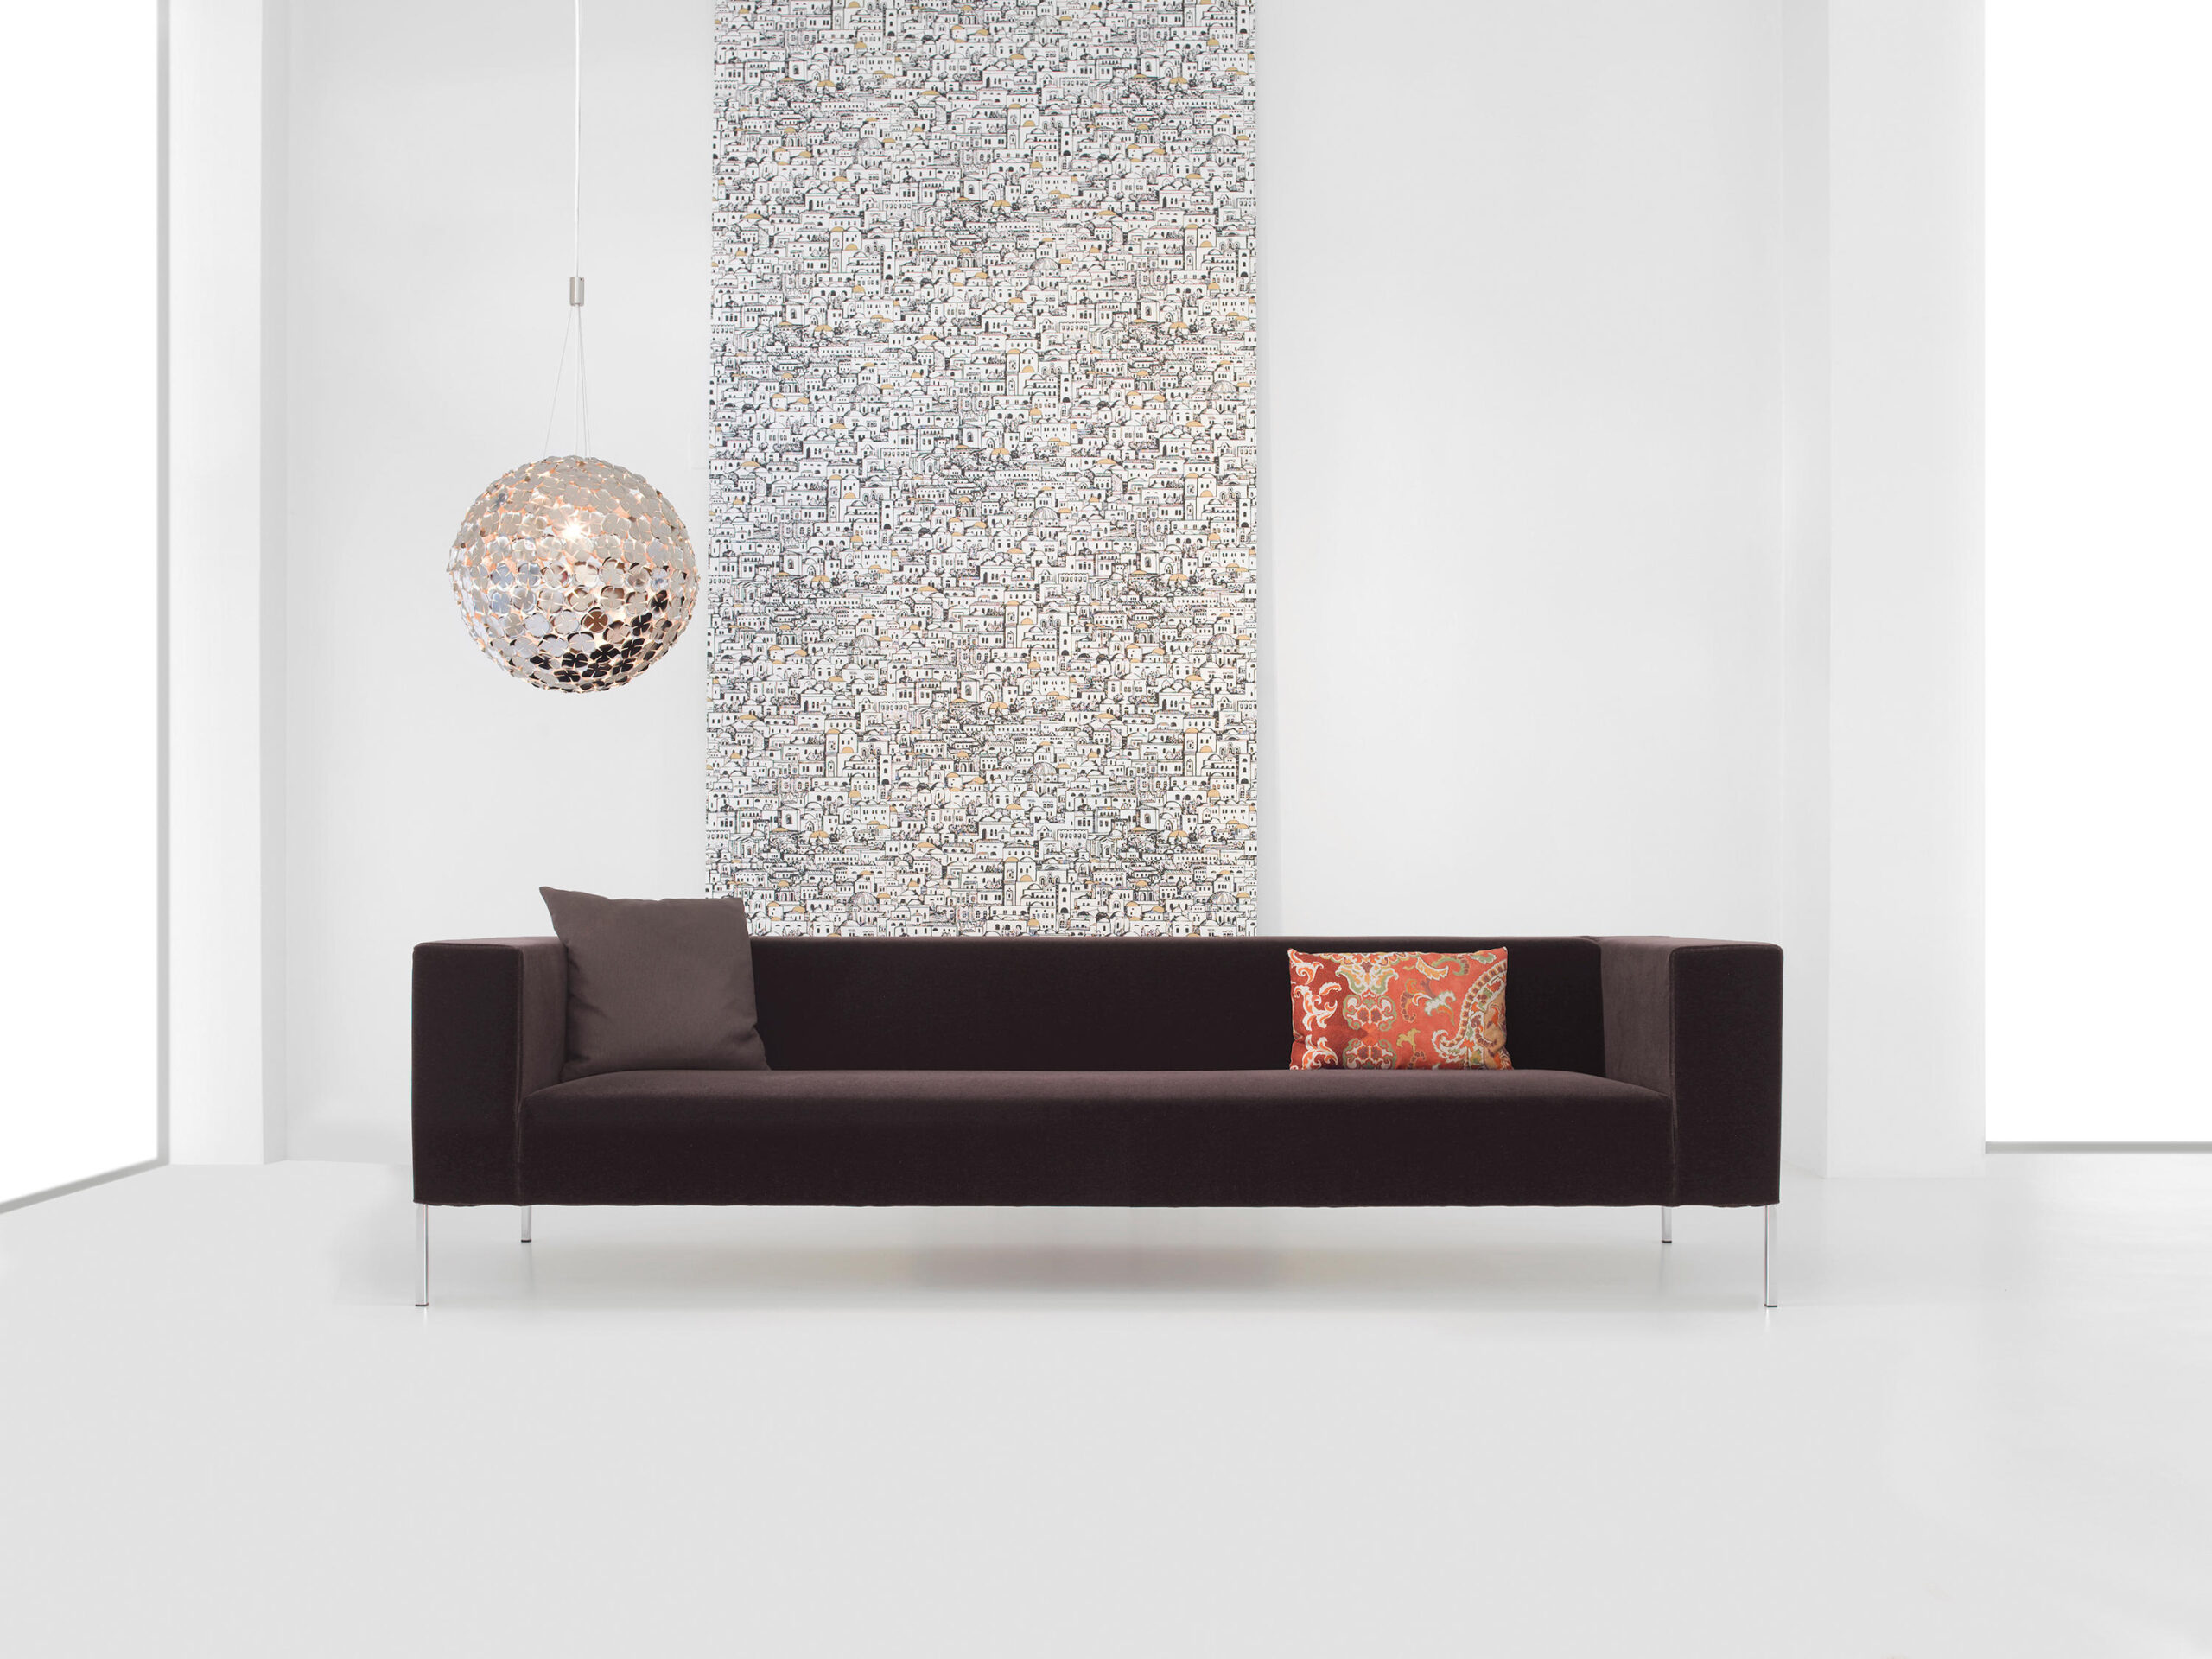 Full Size of Sofa Bezug Abnehmbar Waschbar Mit Abnehmbarem Grau Abnehmbarer Hussen Big Ikea Waschbarer Modulares Abnehmbaren Sofas Kissen Inhofer Garnitur 3 Teilig Sofa Sofa Abnehmbarer Bezug